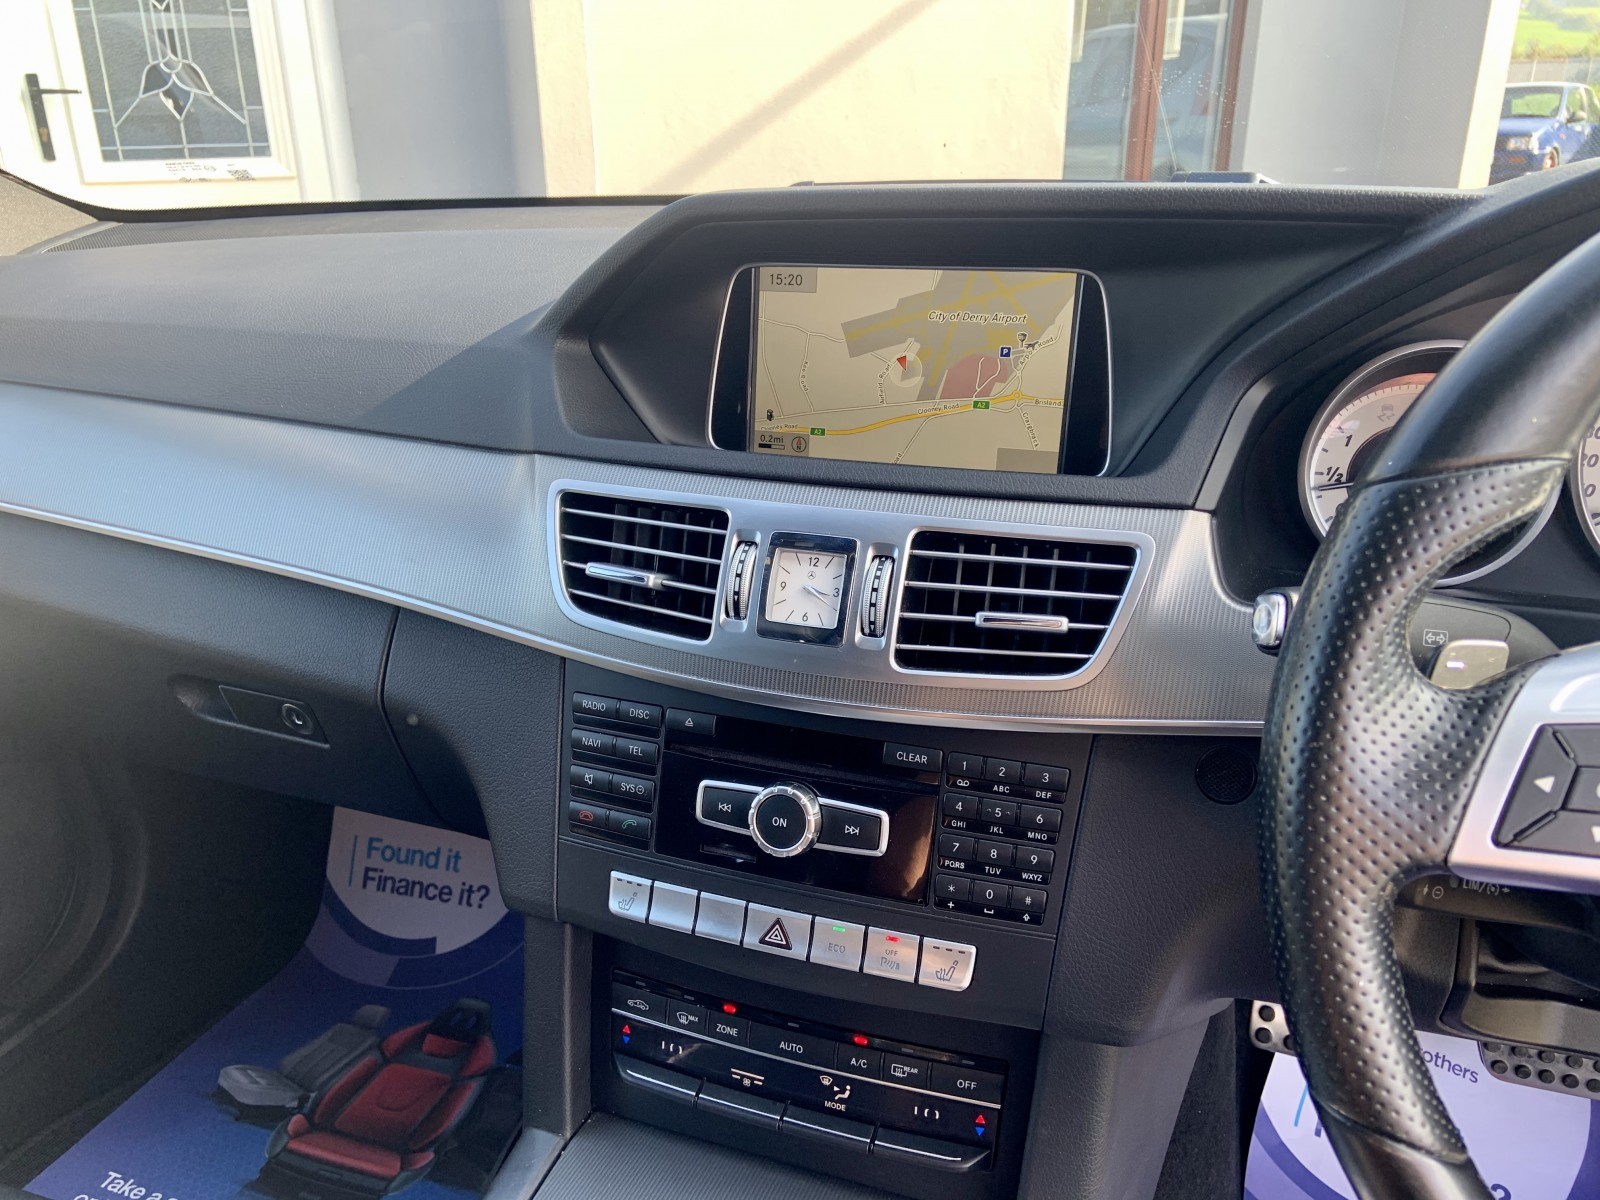 2014 Mercedes-Benz E Class E220 CDI AMG SPORT Diesel Automatic – BC Autosales 17A Airfield Road, Eglinton, Londonderry BT47 3PZ, UK full